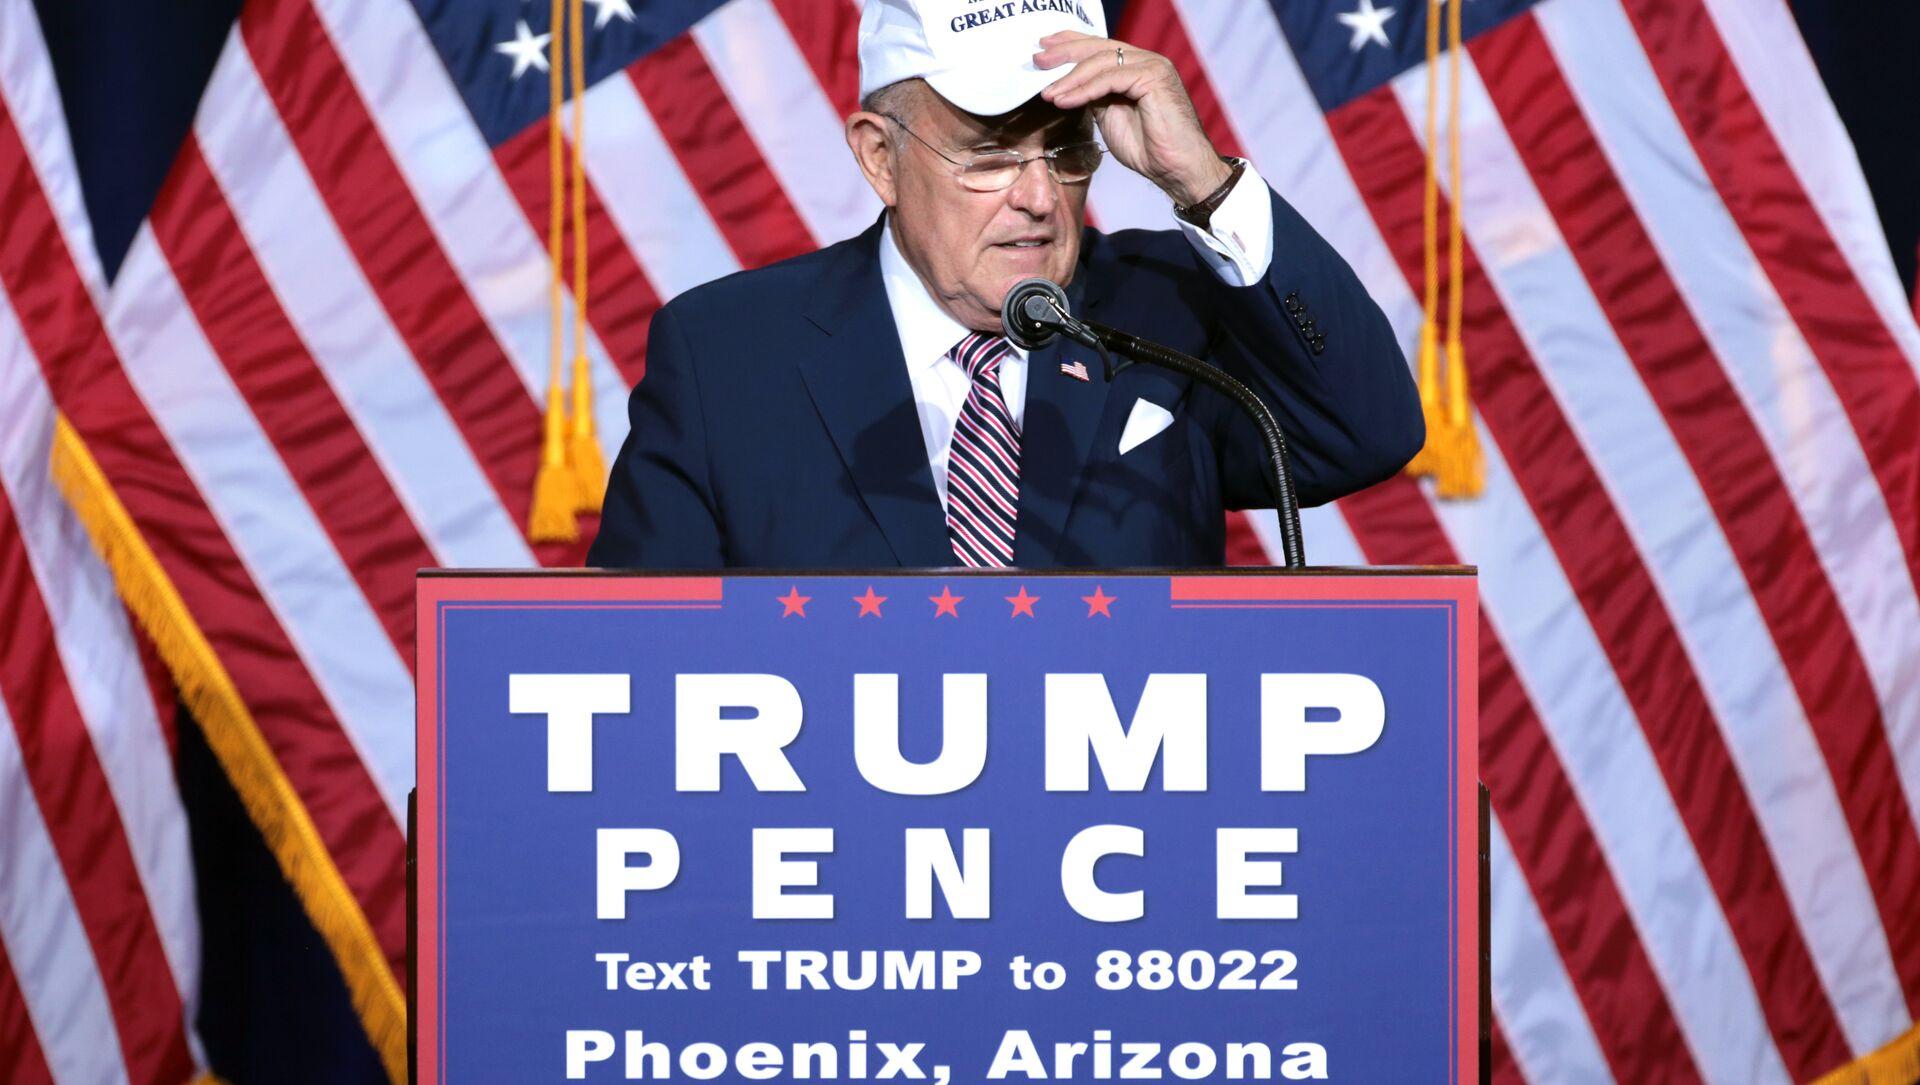 Trump Surrogate Rudy Giuliani - Sputnik International, 1920, 02.08.2021